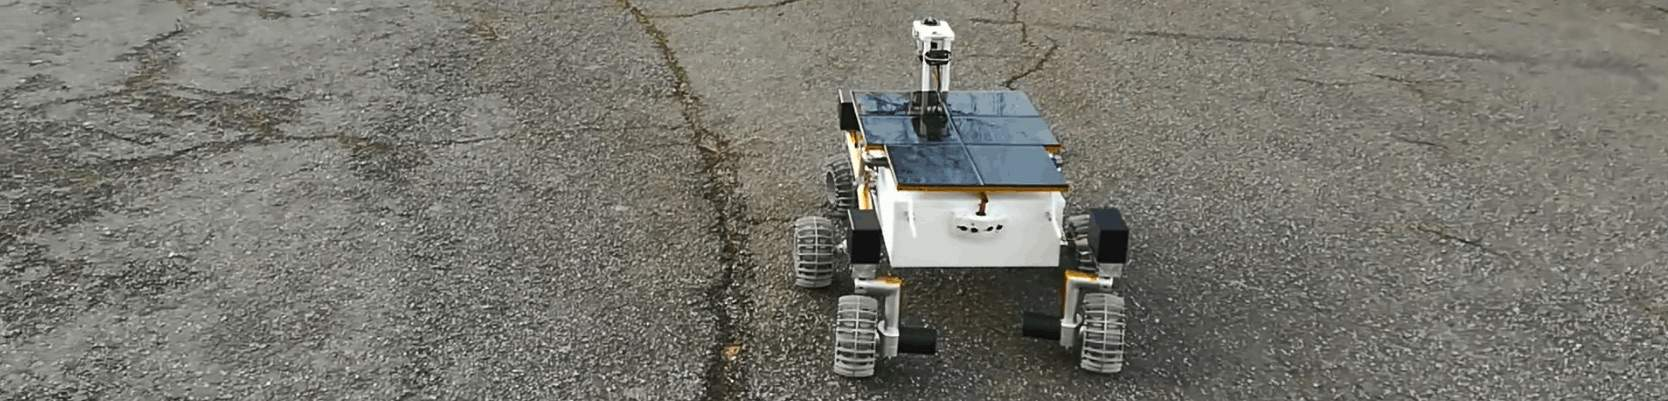 Robotique 3